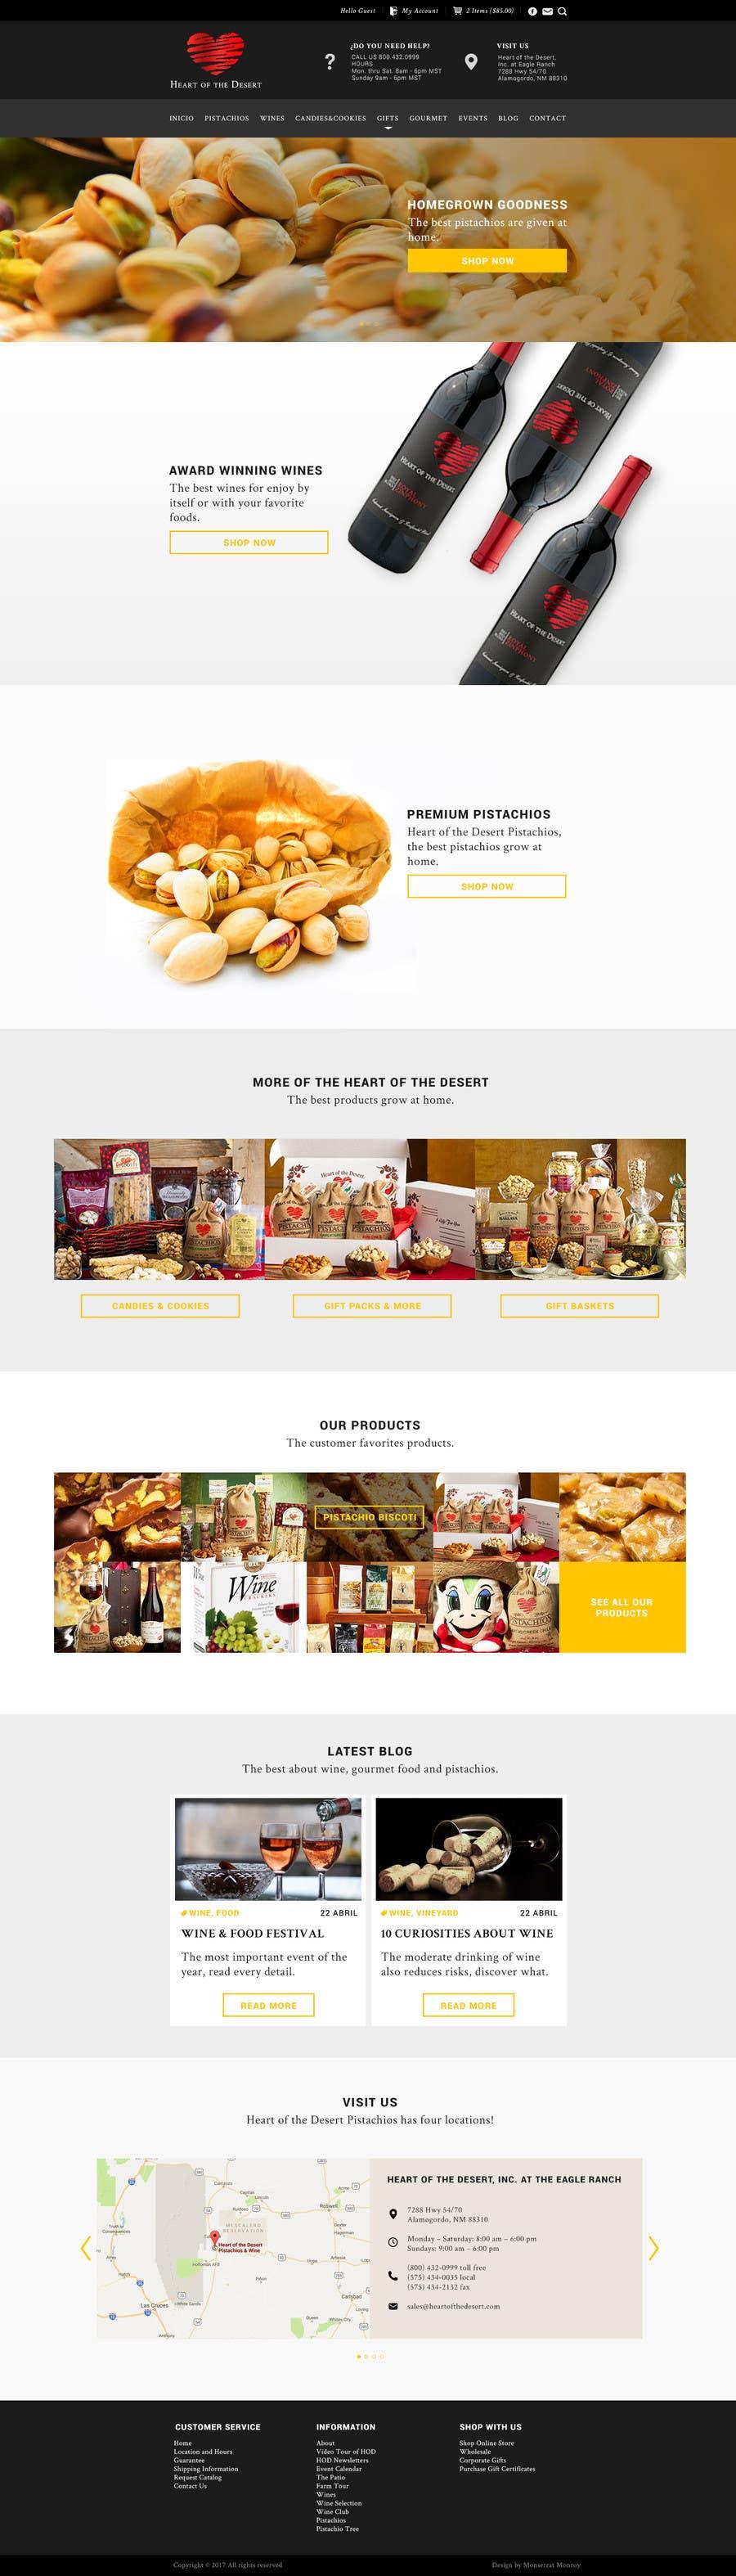 Proposition n°5 du concours Design a Website Mockup for E-commerce Site